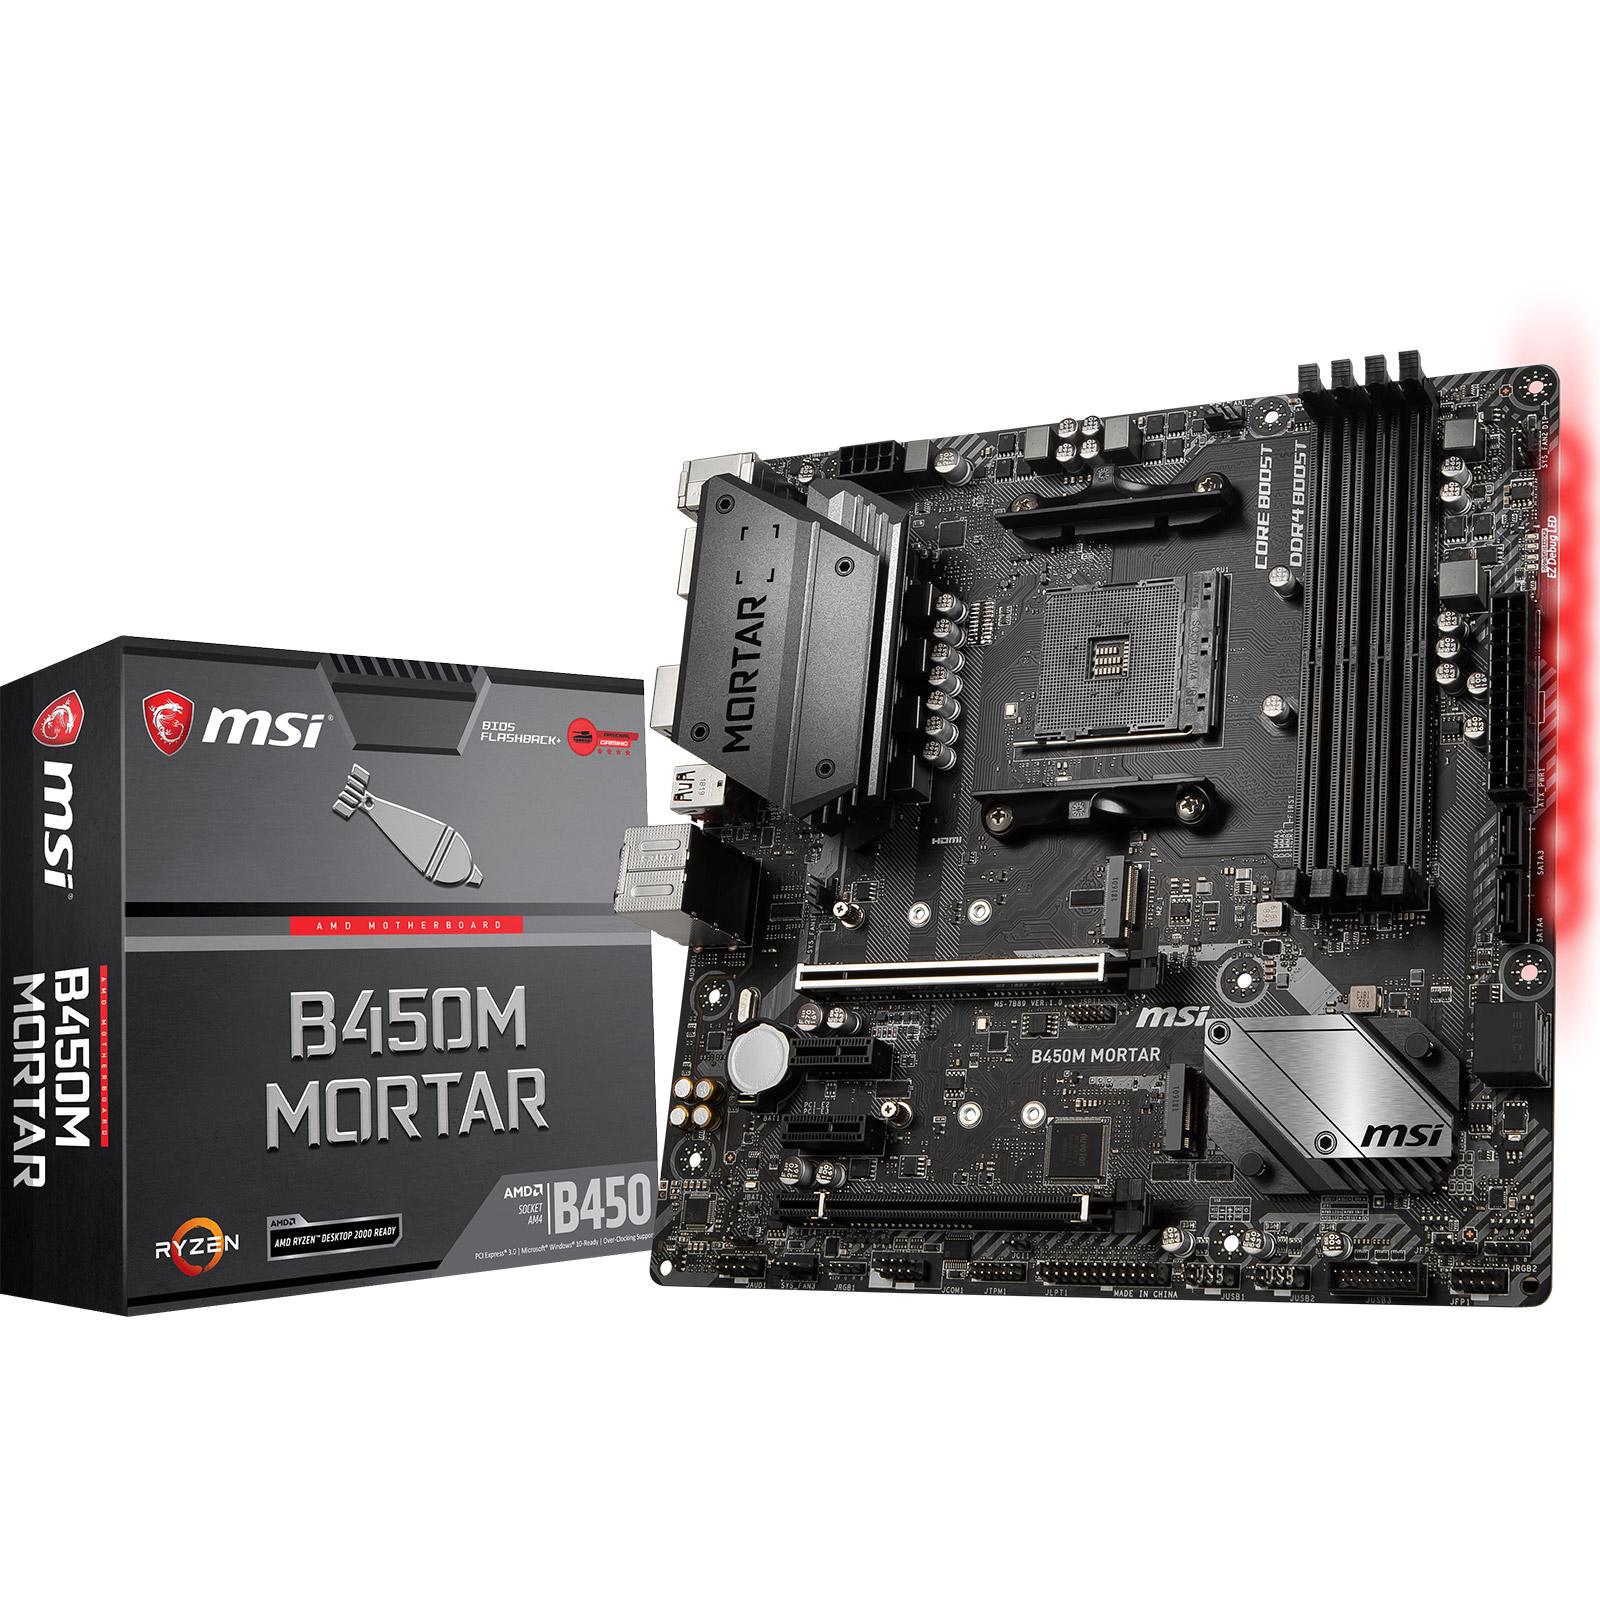 Carte mère MSI B450M MORTAR Carte mère Micro ATX Socket AM4 AMD B450 - 4x DDR4 - SATA 6Gb/s + M.2 - USB 3.1 - 1x PCI-Express 3.0 16x